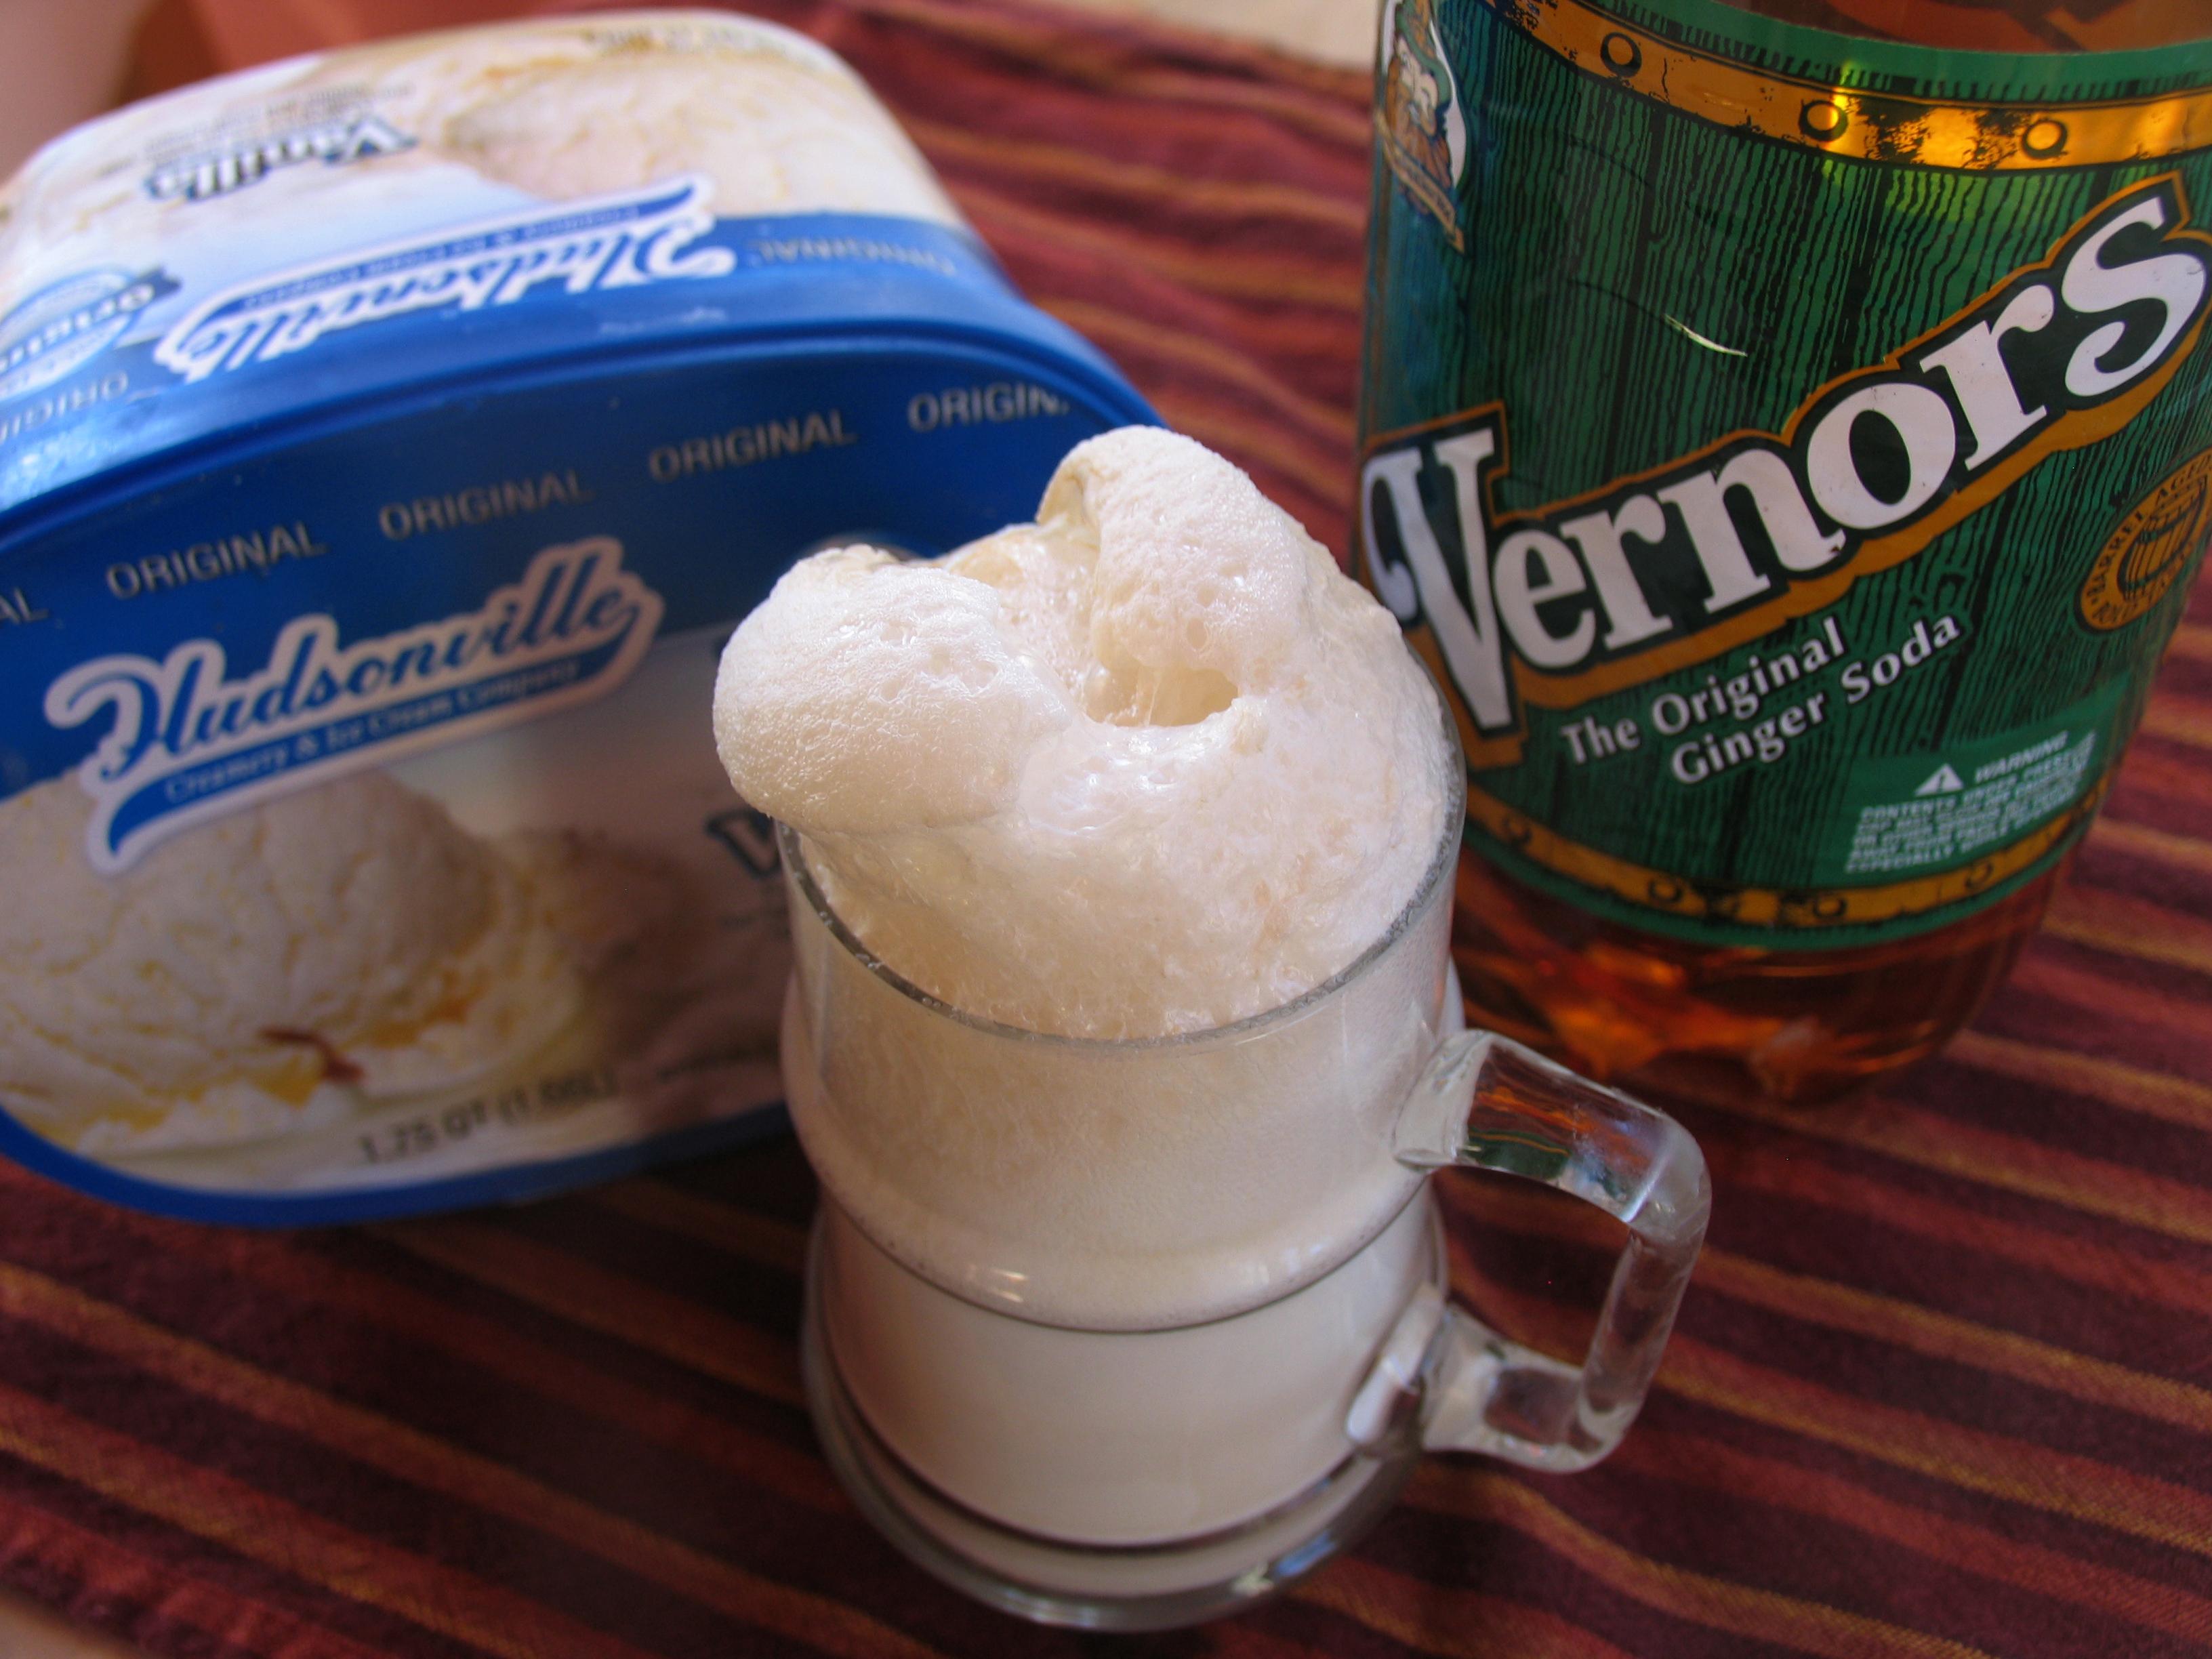 Vernors + Vanilla ice cream=Boston Cooler